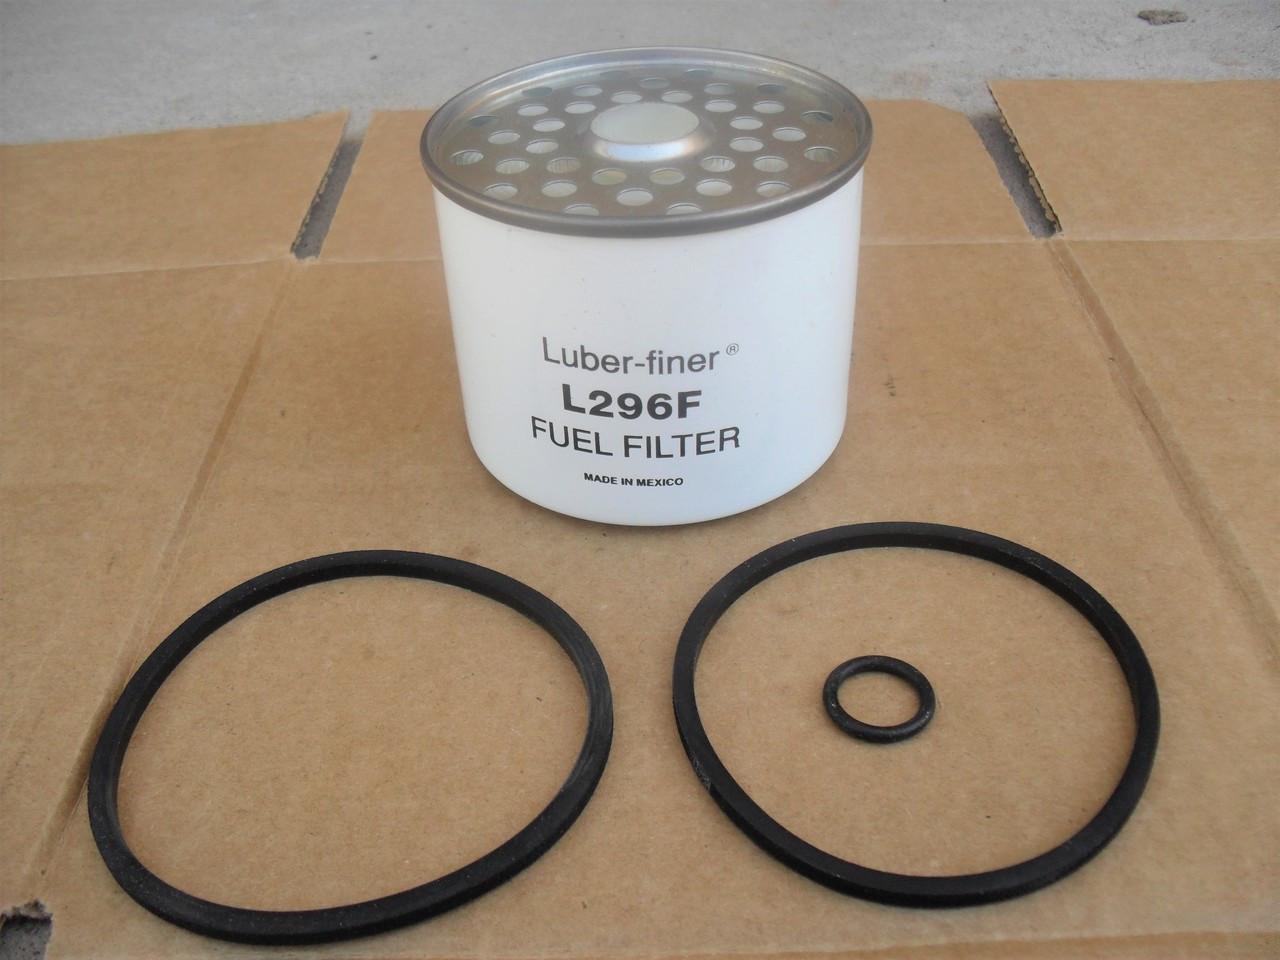 hight resolution of fuel filter for vermeer m450 m475 m485 m485 m50 v430 v434 trencher 15340001 20776001 81557001 www lawnmowerpartstore com